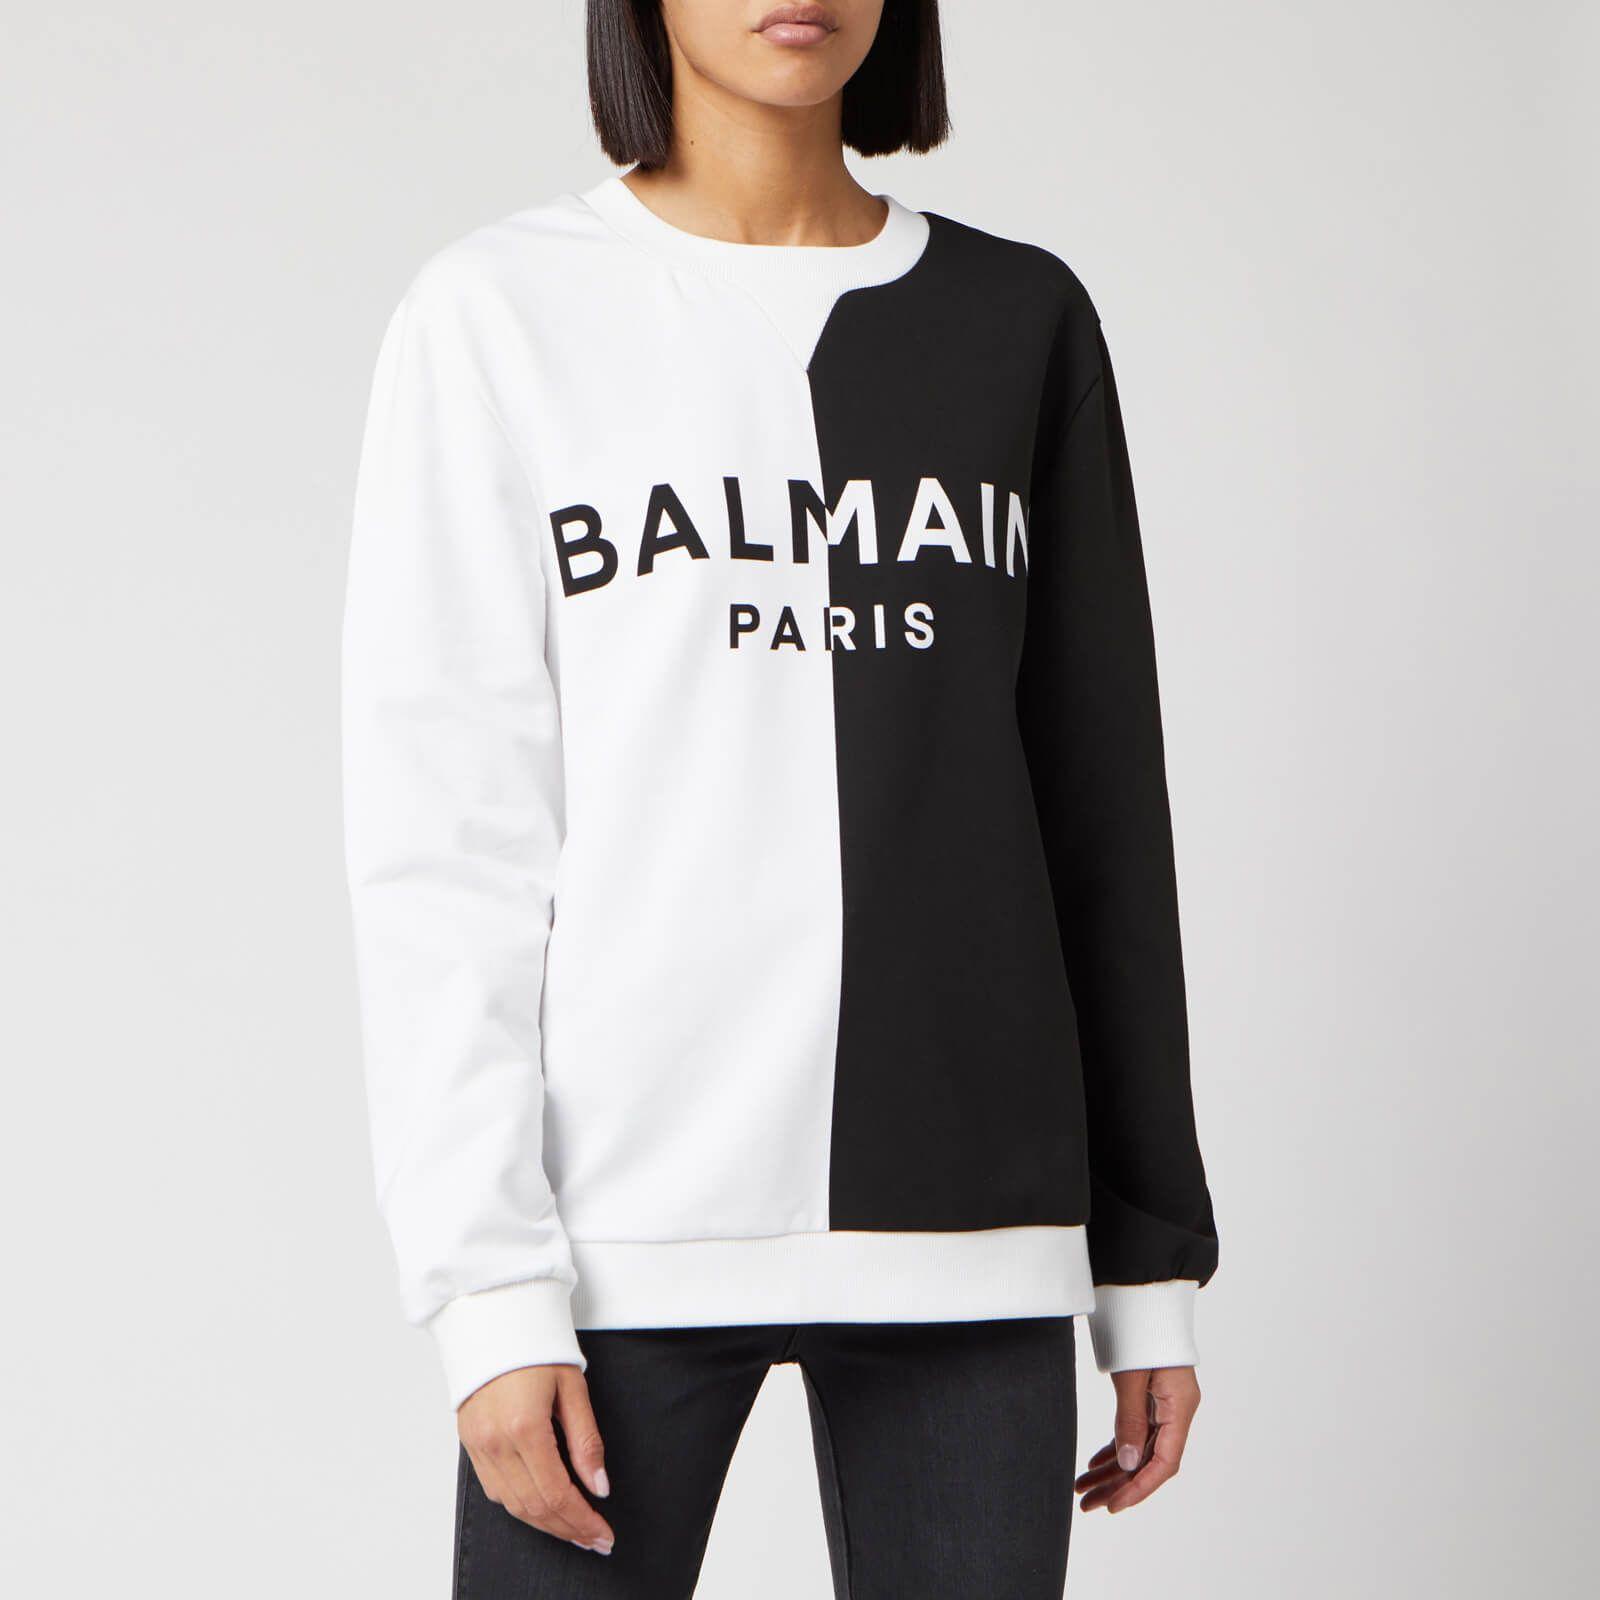 Balmain Women S Bicolored Logo Sweatshirt White Black Xs Usd514 08 White Sweatshirt Sweatshirts Long Sleeve Sweatshirts [ 1600 x 1600 Pixel ]